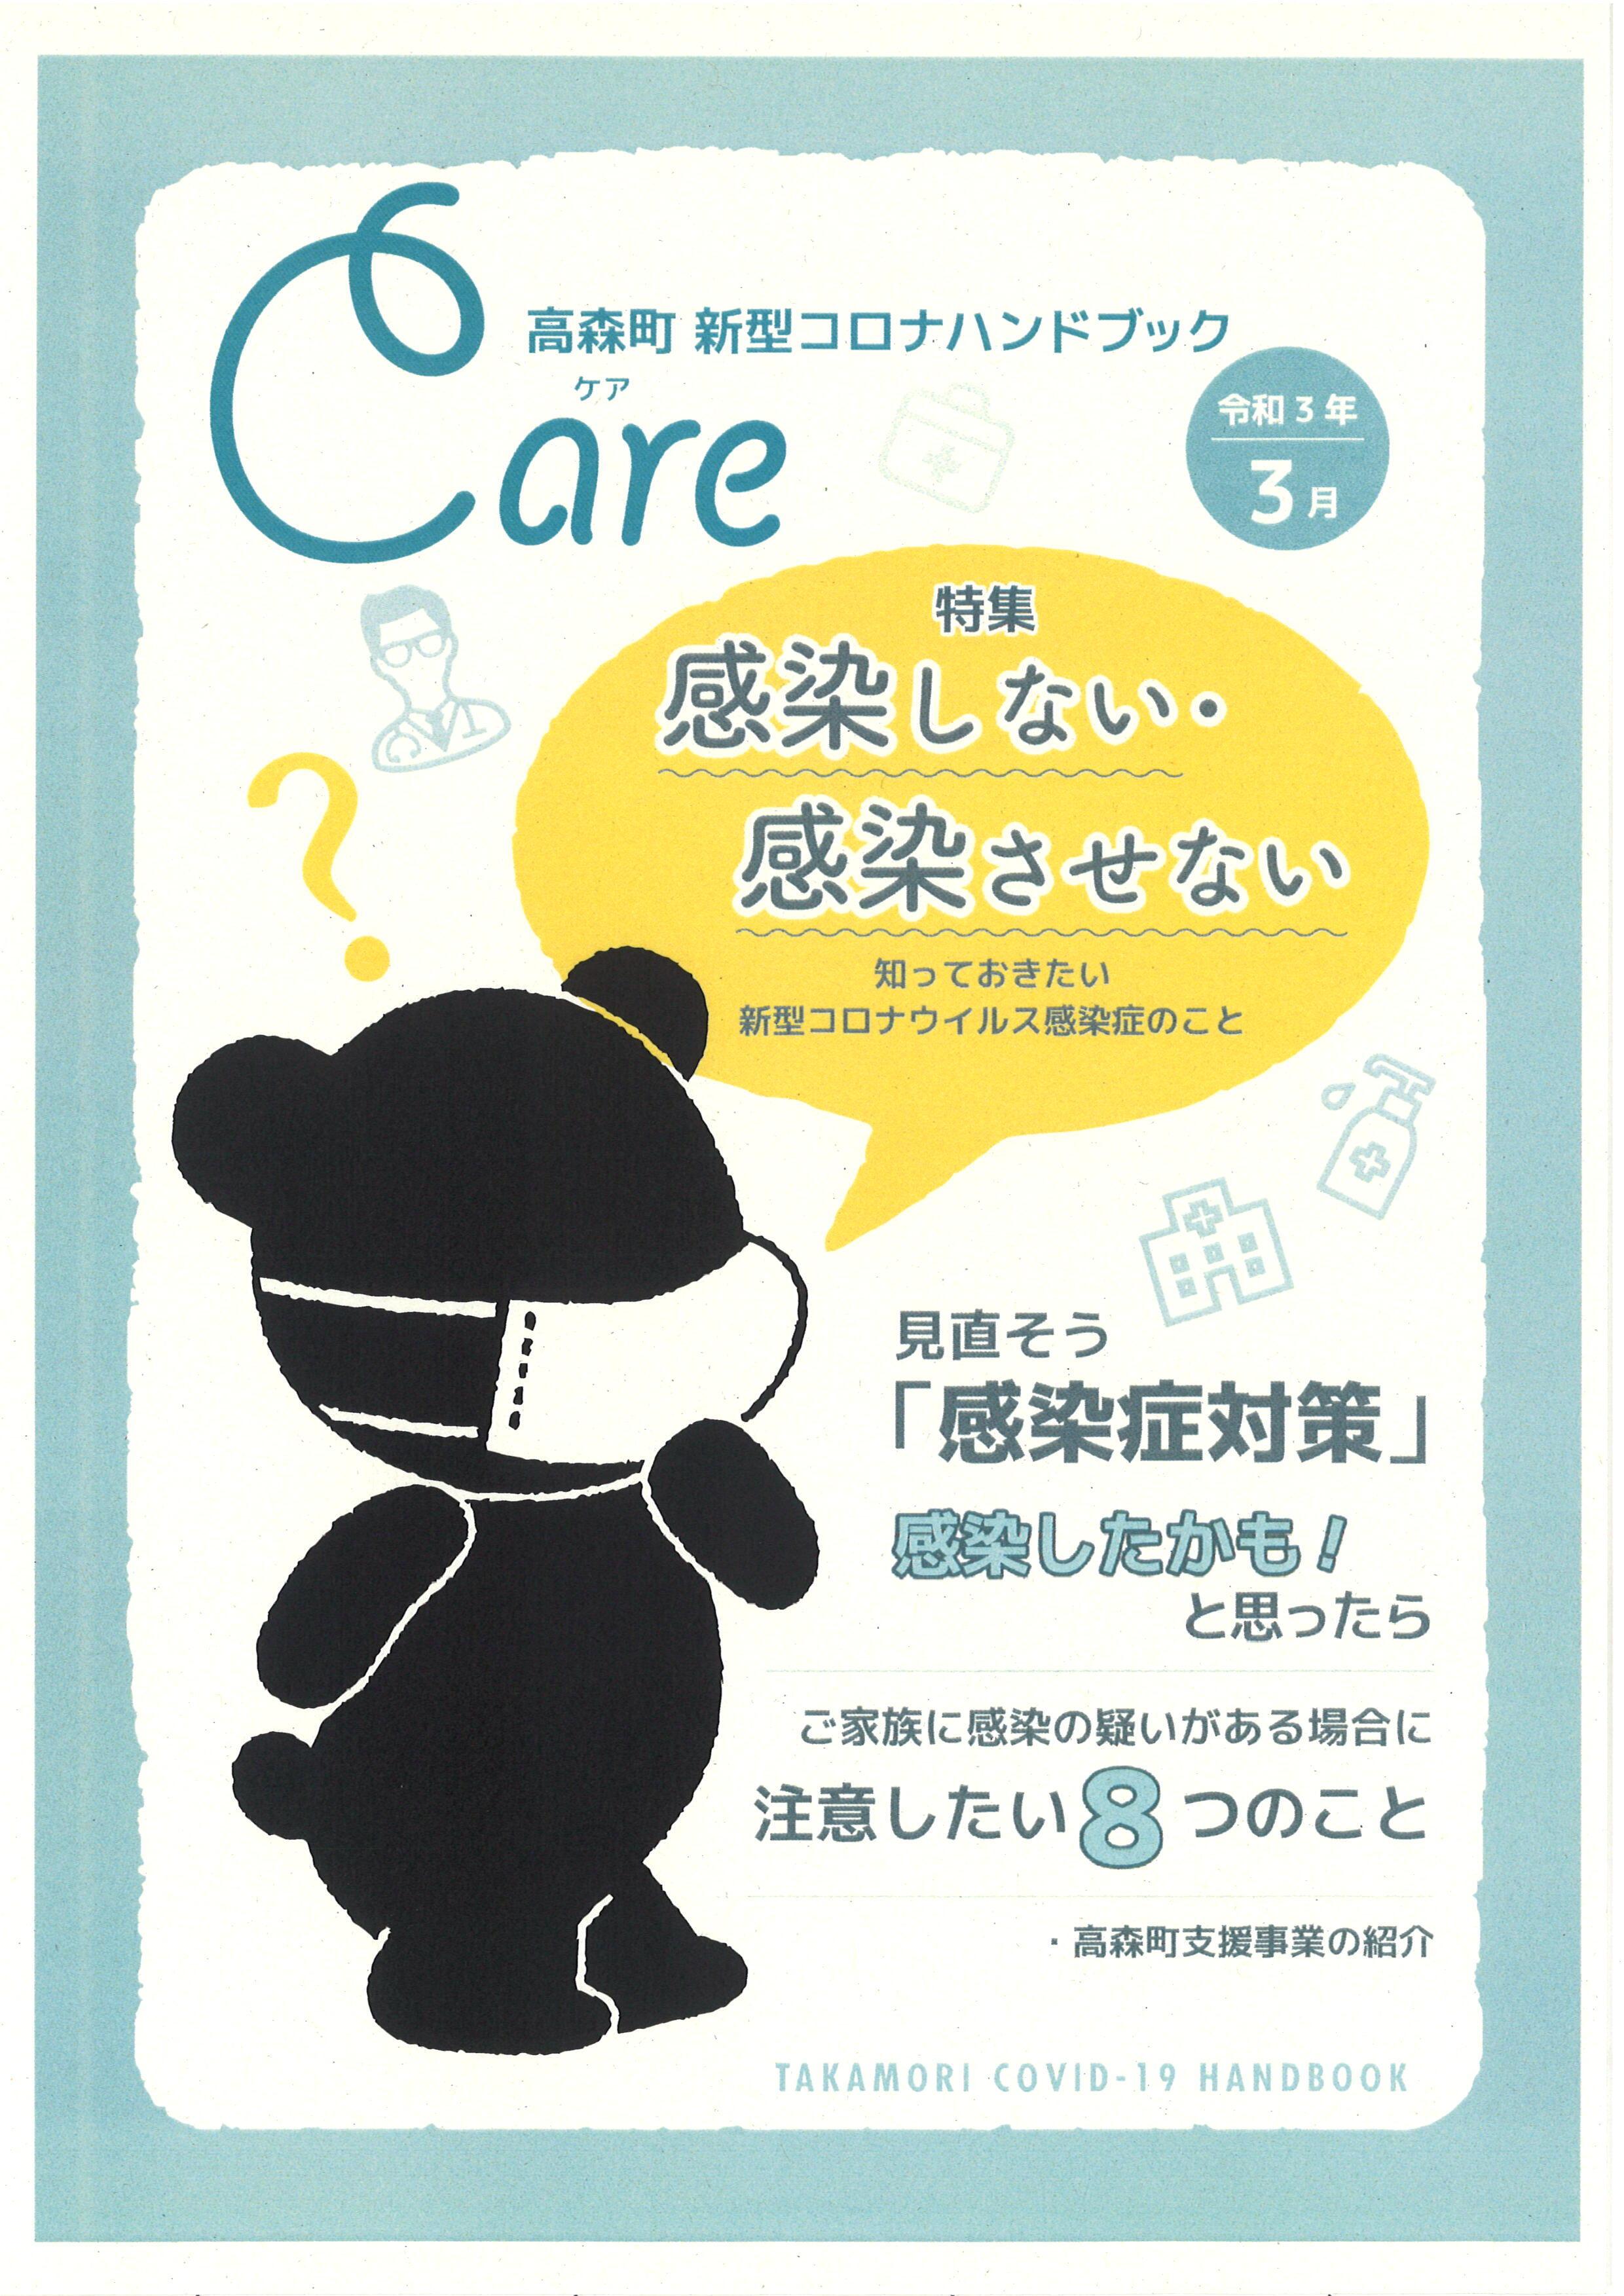 http://www.town.takamori.kumamoto.jp/chosha/somu/upload/20210419171248_001.jpg